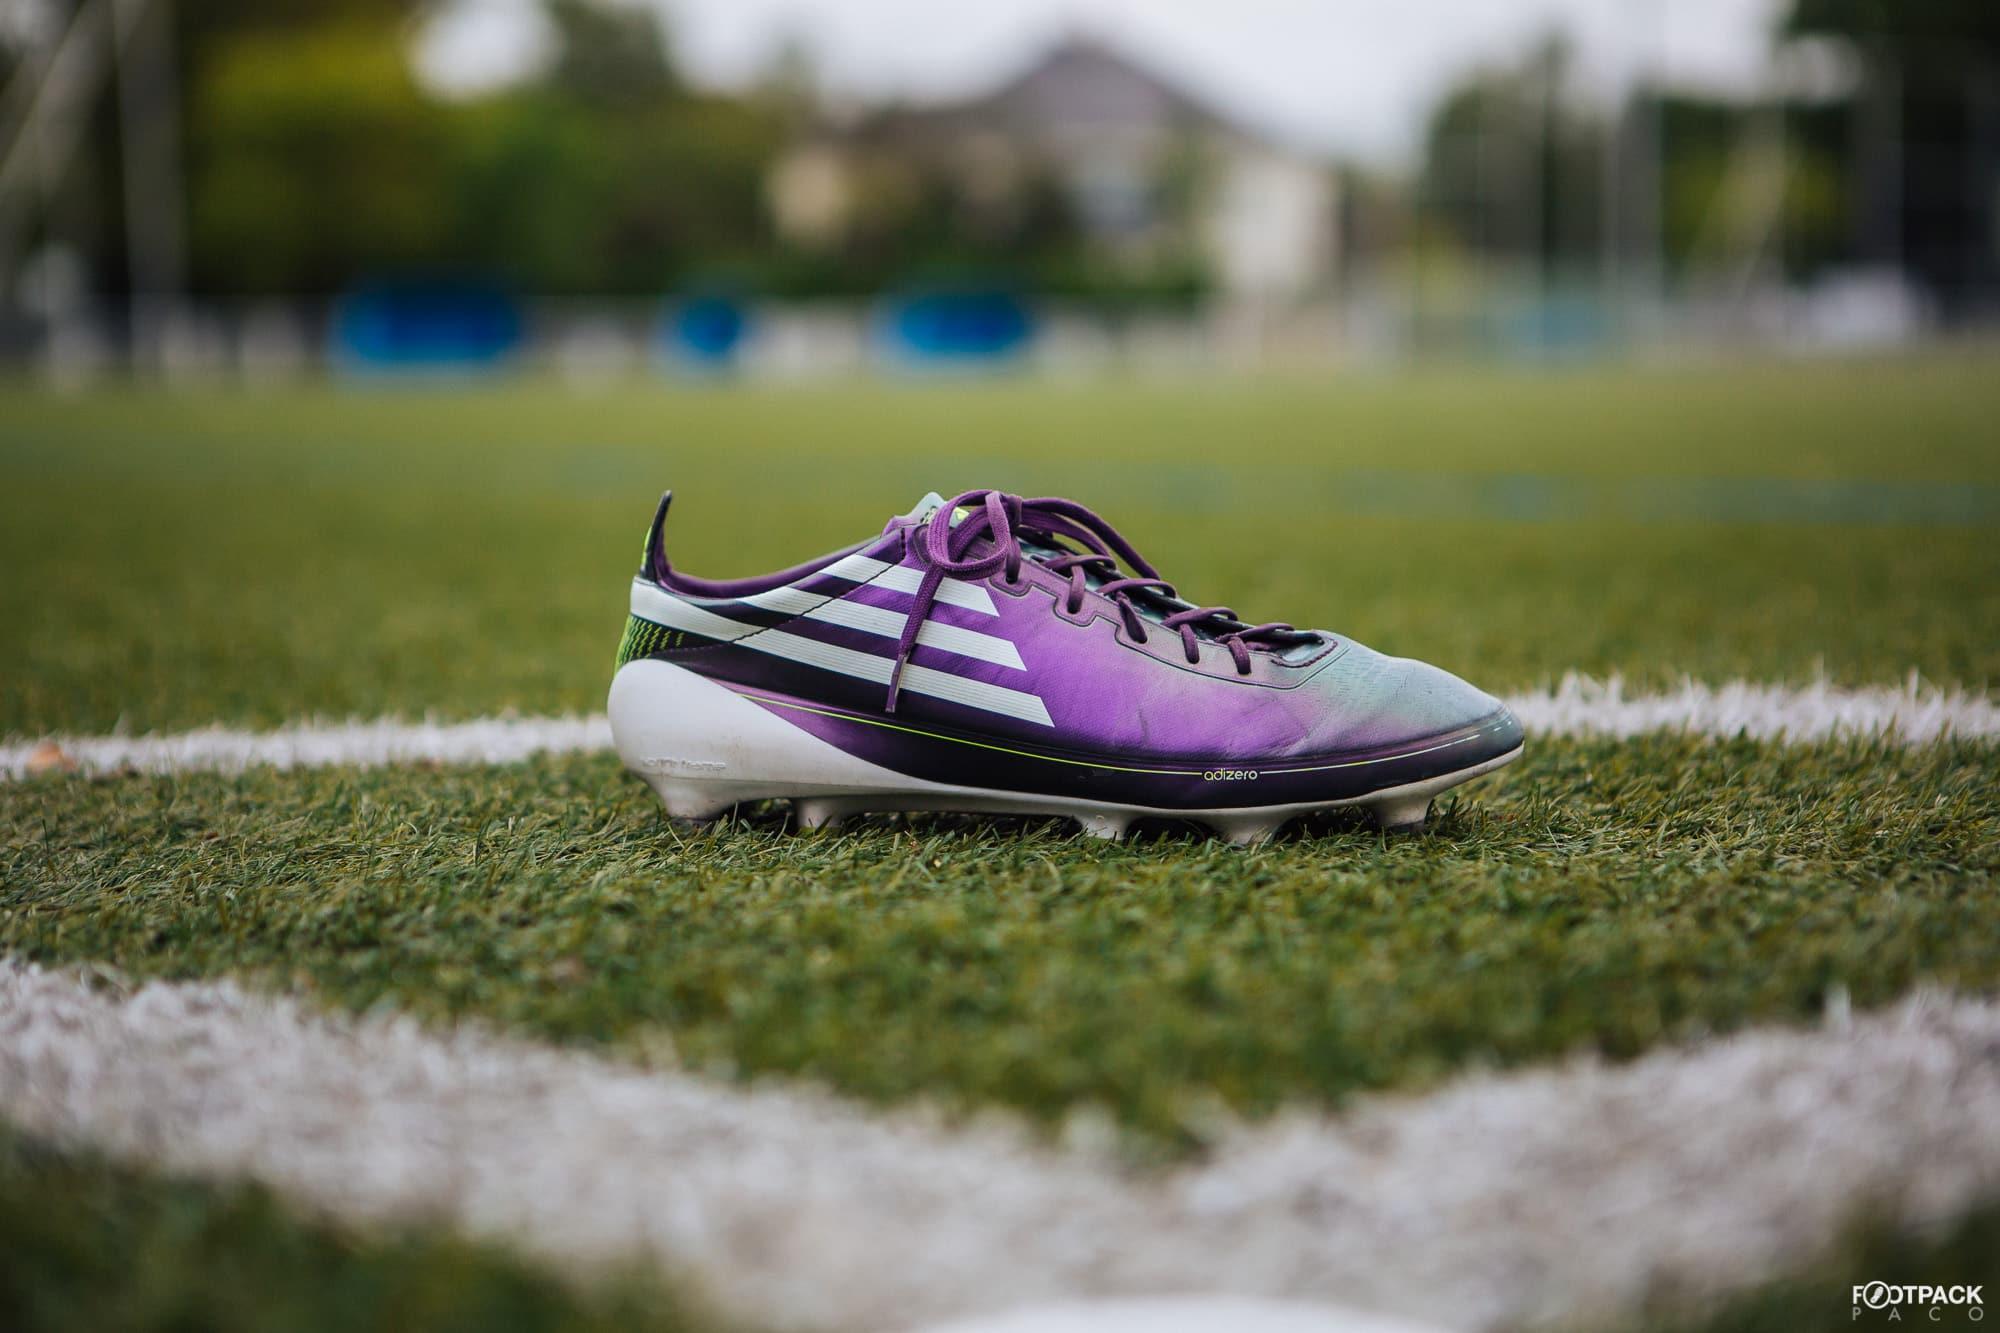 Chaussures-football-adidas-glitch-f50-mai-2018-1